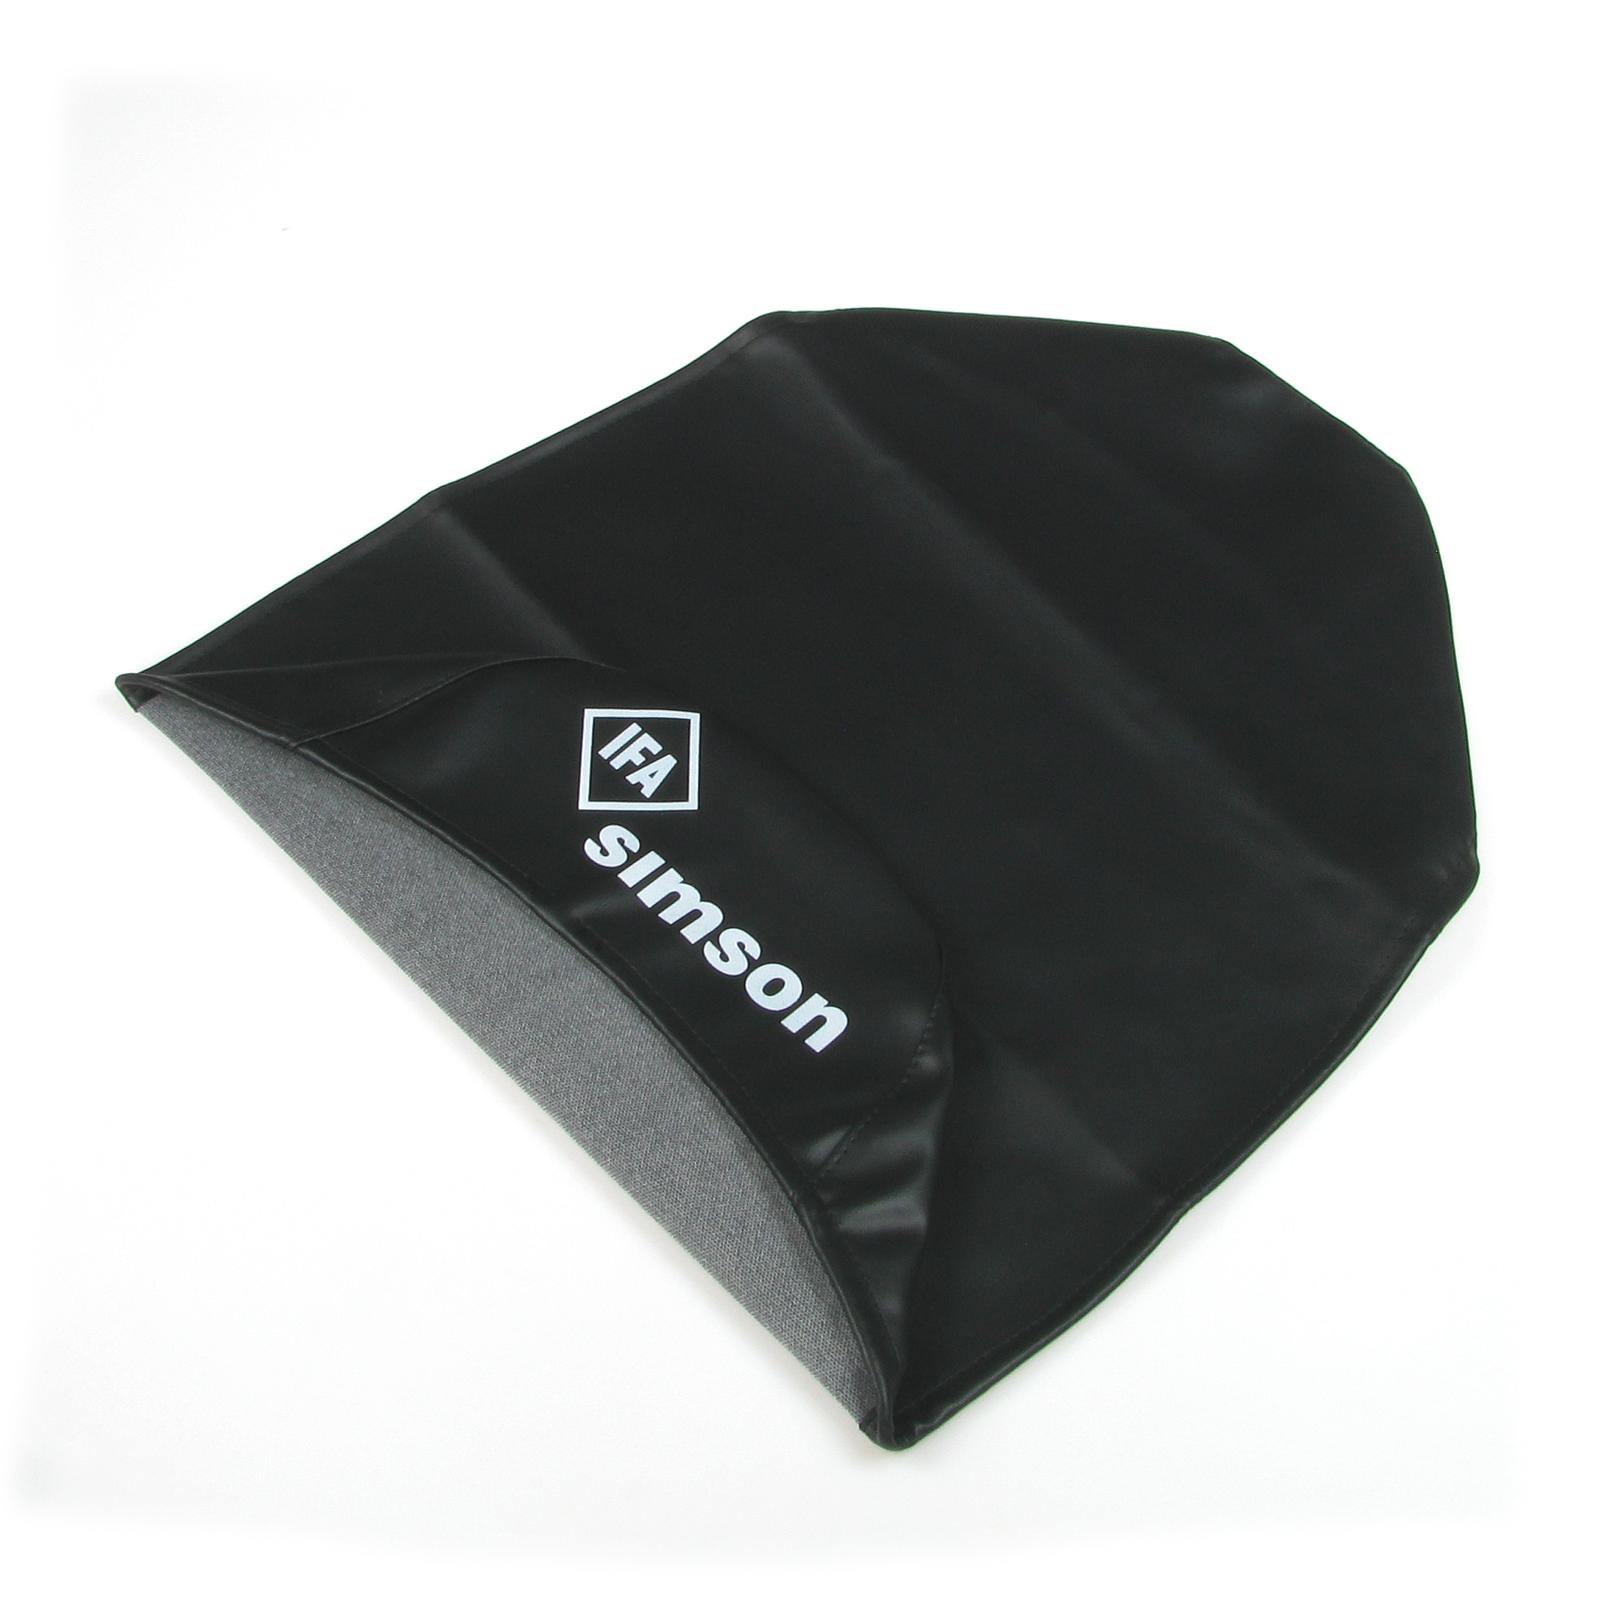 Sitzbezug SIMSON schwarz KR51//2 glatt f/ür S51 S70